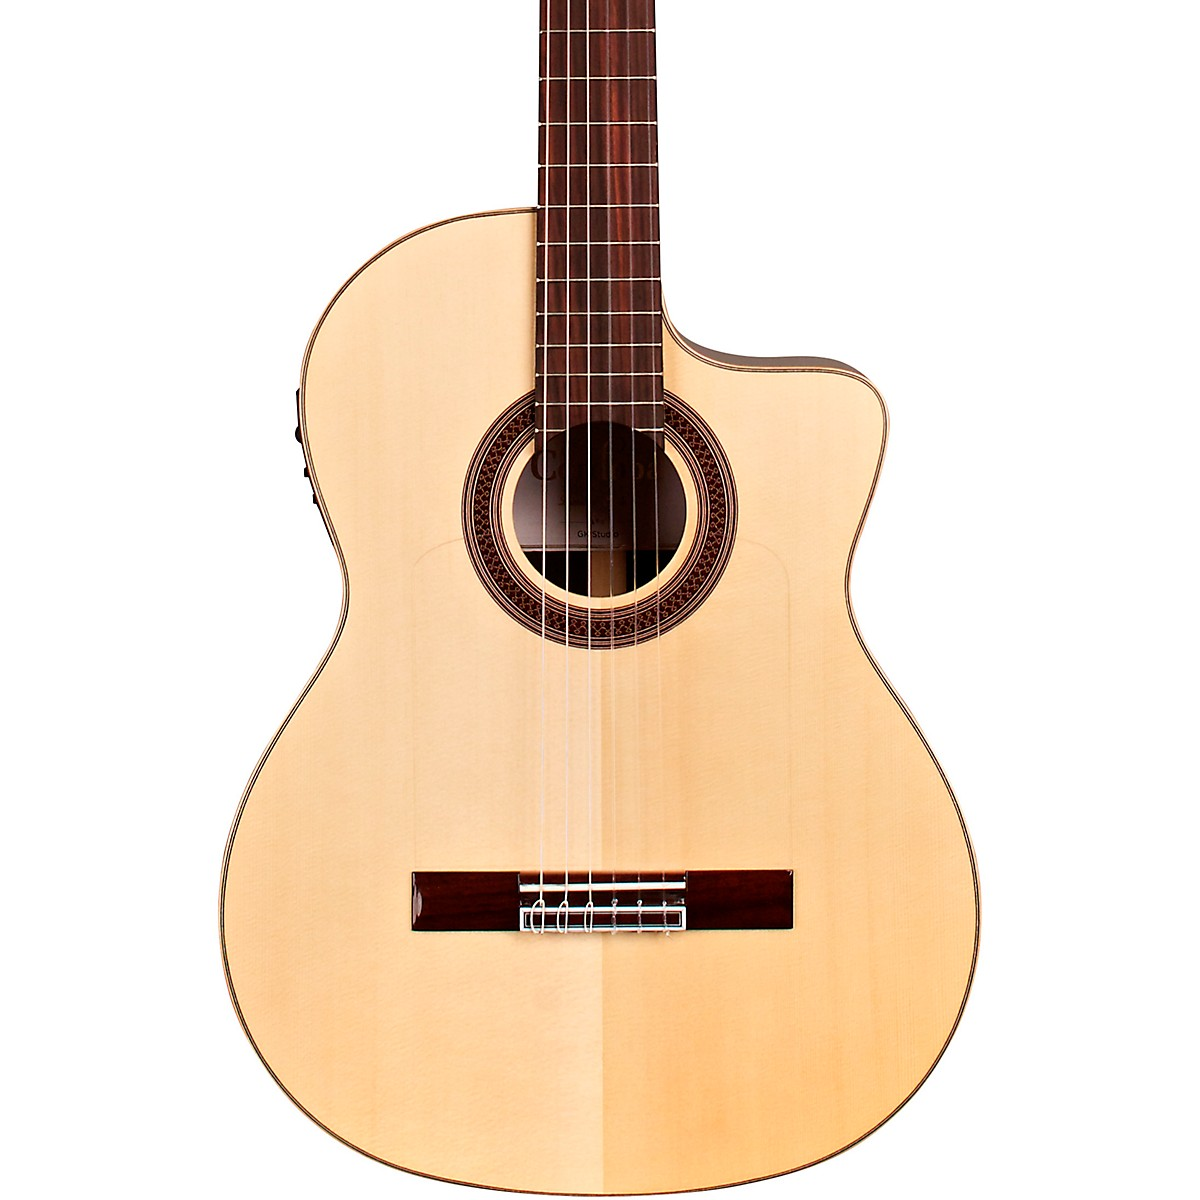 Cordoba GK Studio Limited Flamenco Acoustic-Electric Guitar